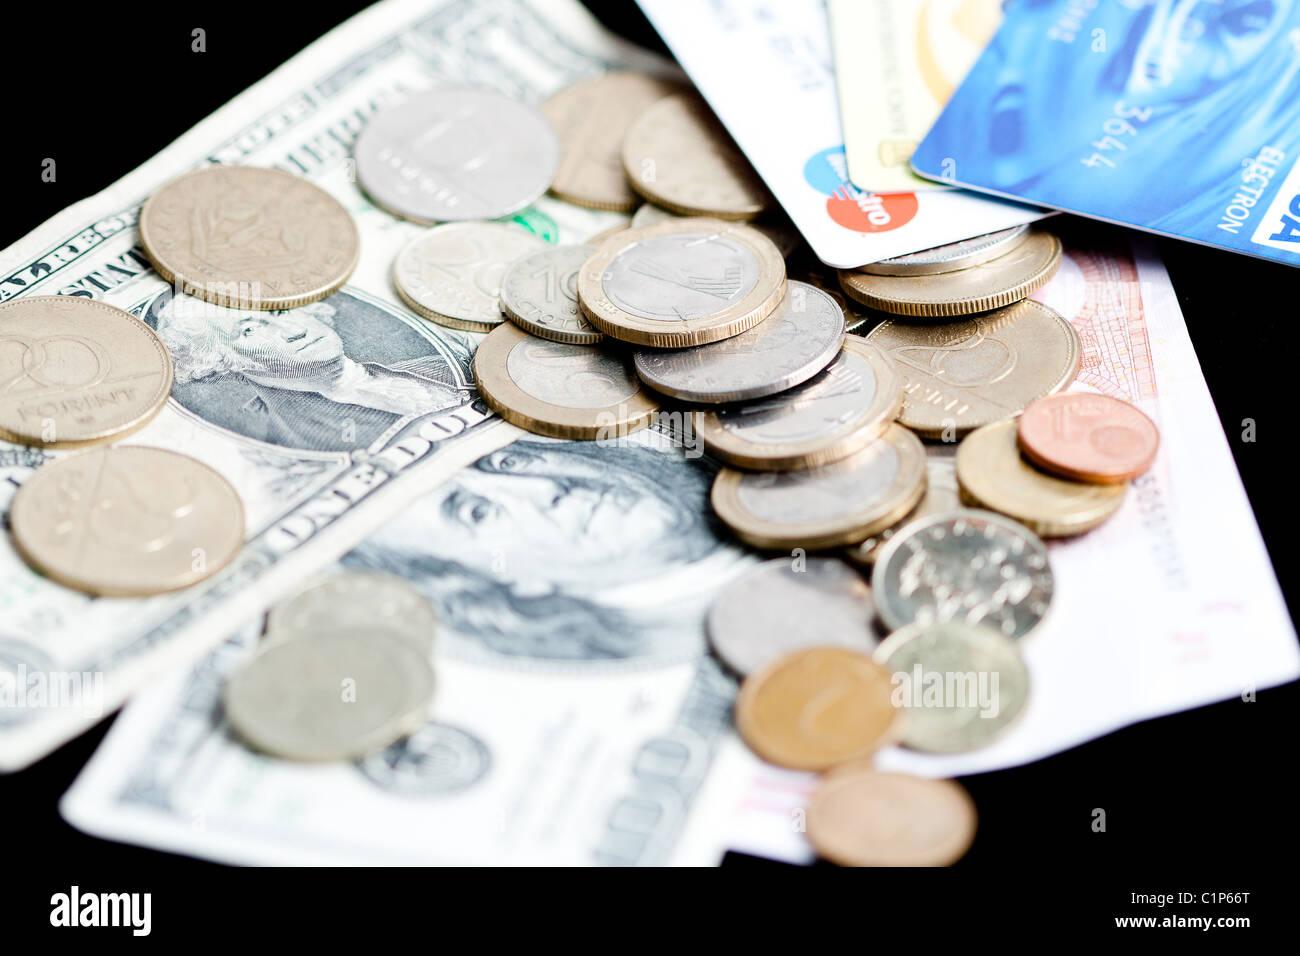 plastic money has replaced paper money